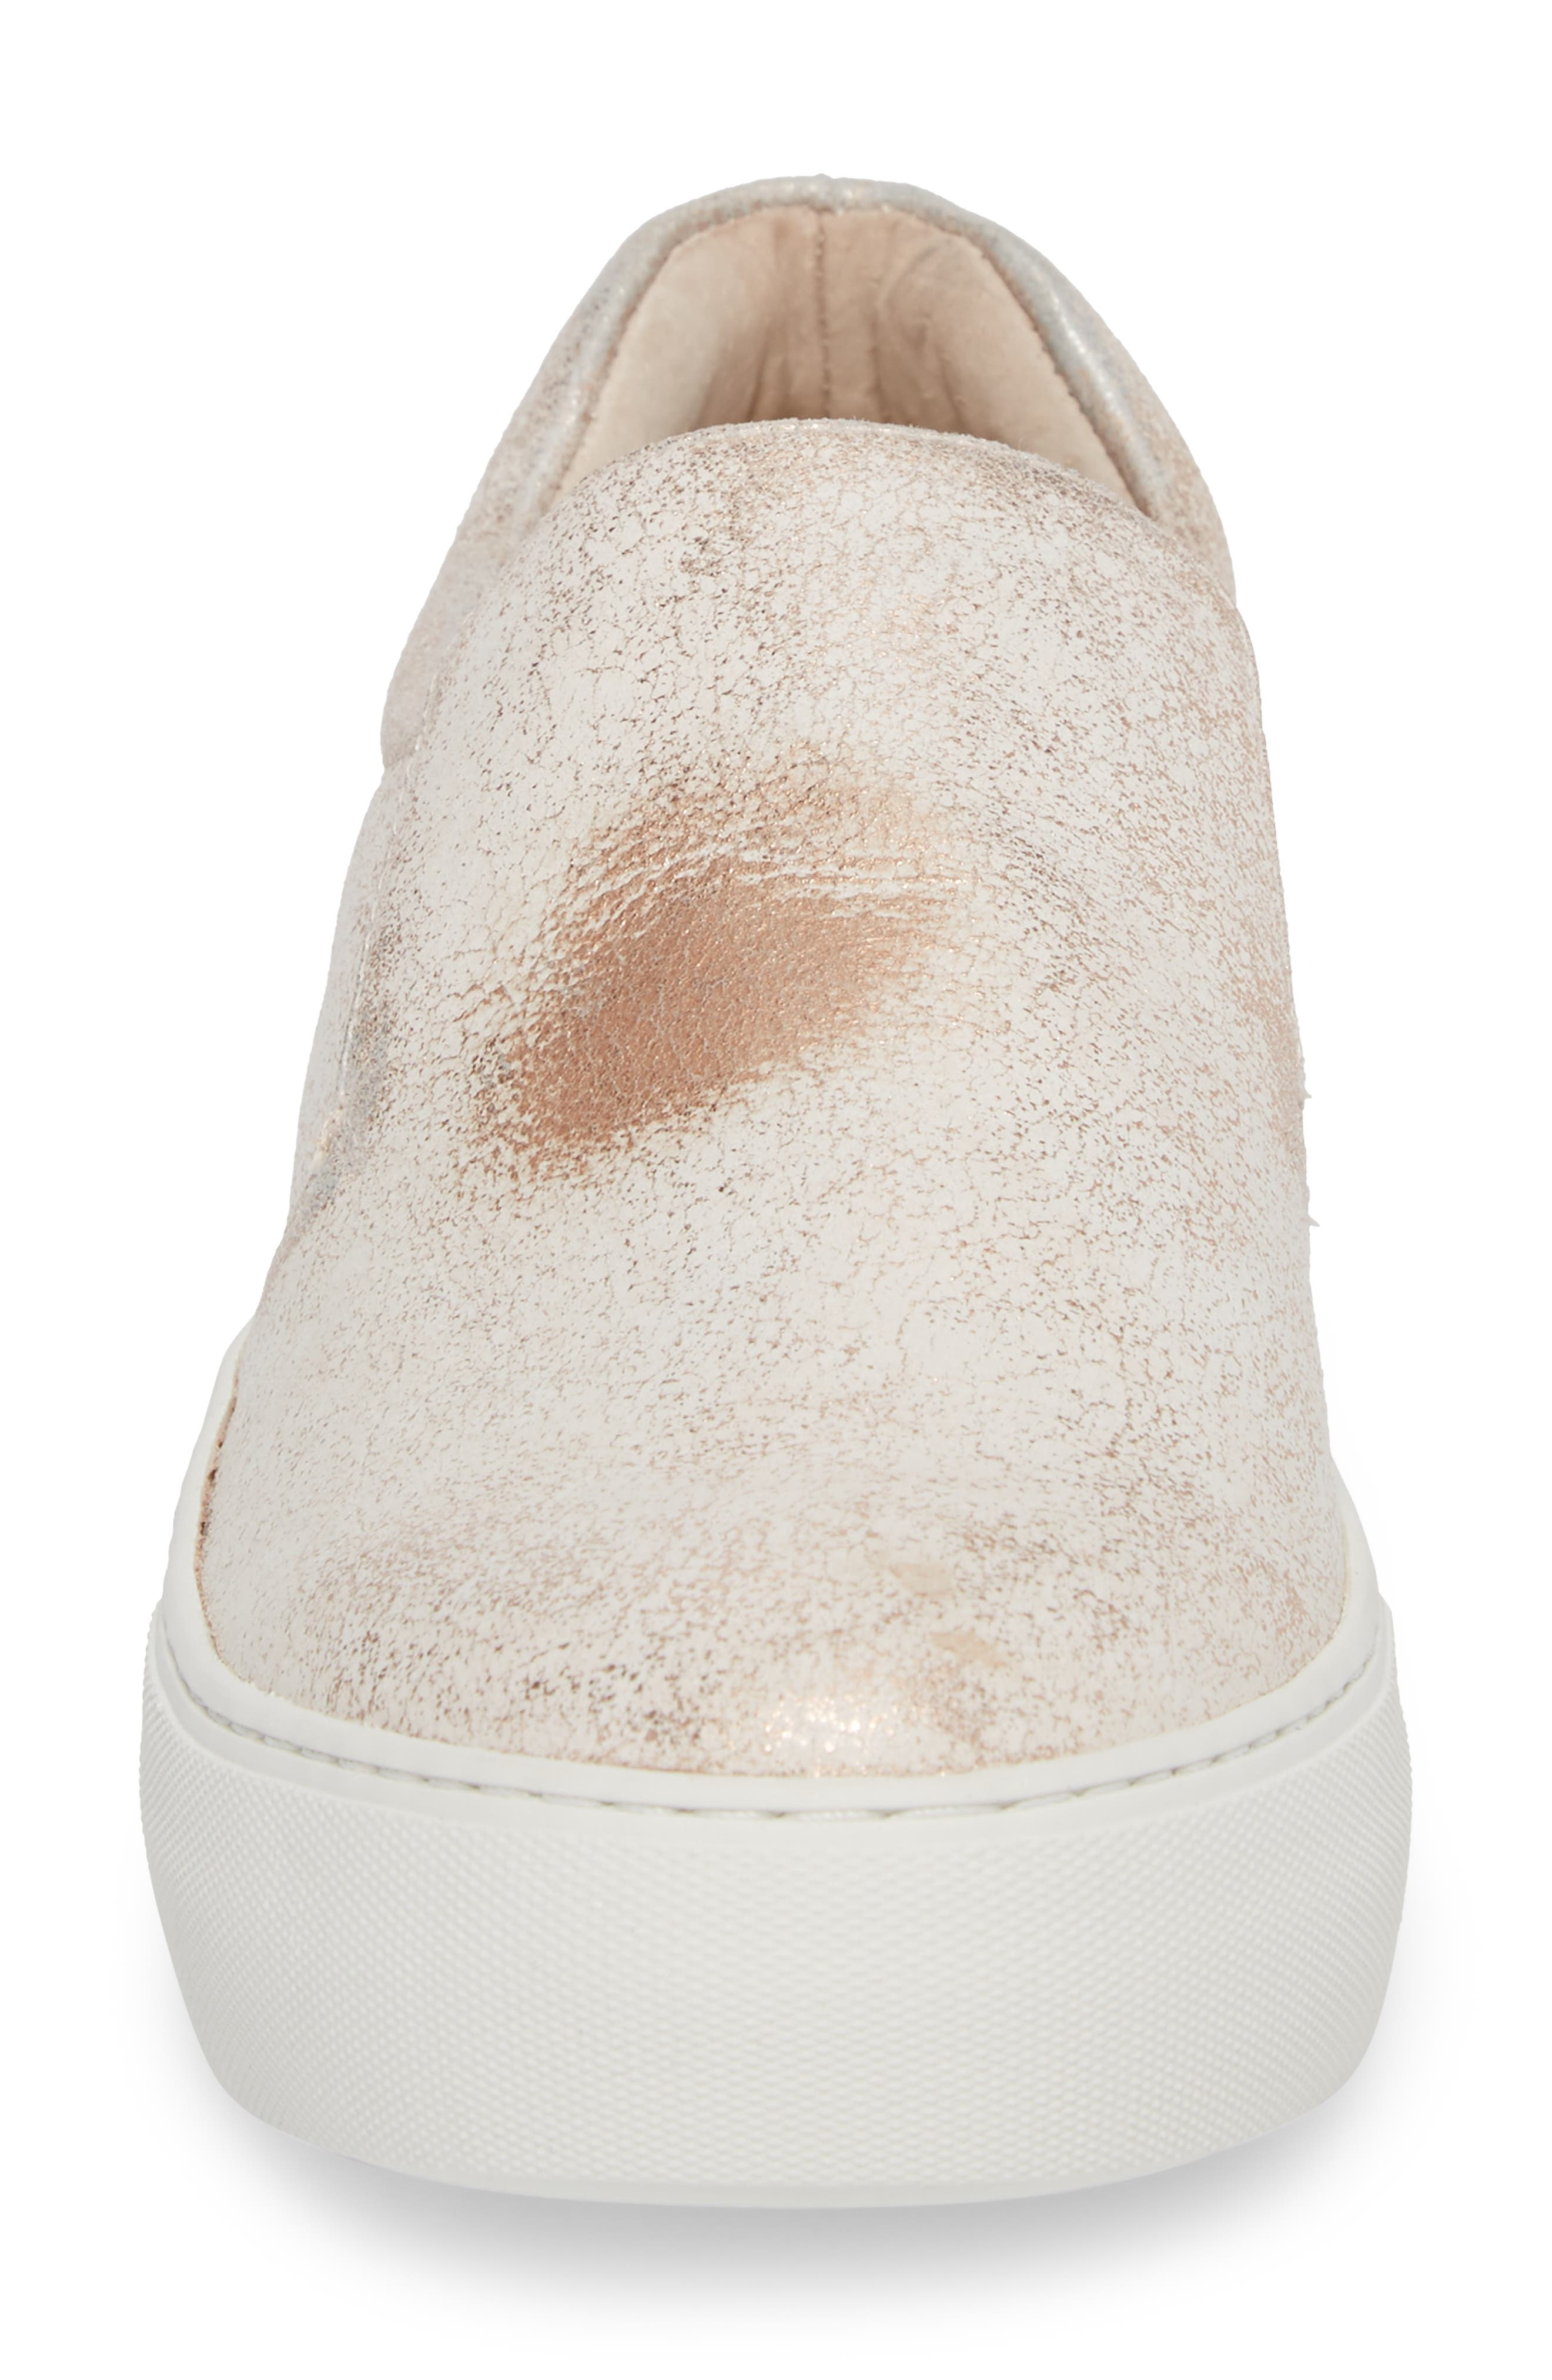 Acer Slip-On Sneaker,                             Alternate thumbnail 4, color,                             SOFT PINK SUEDE